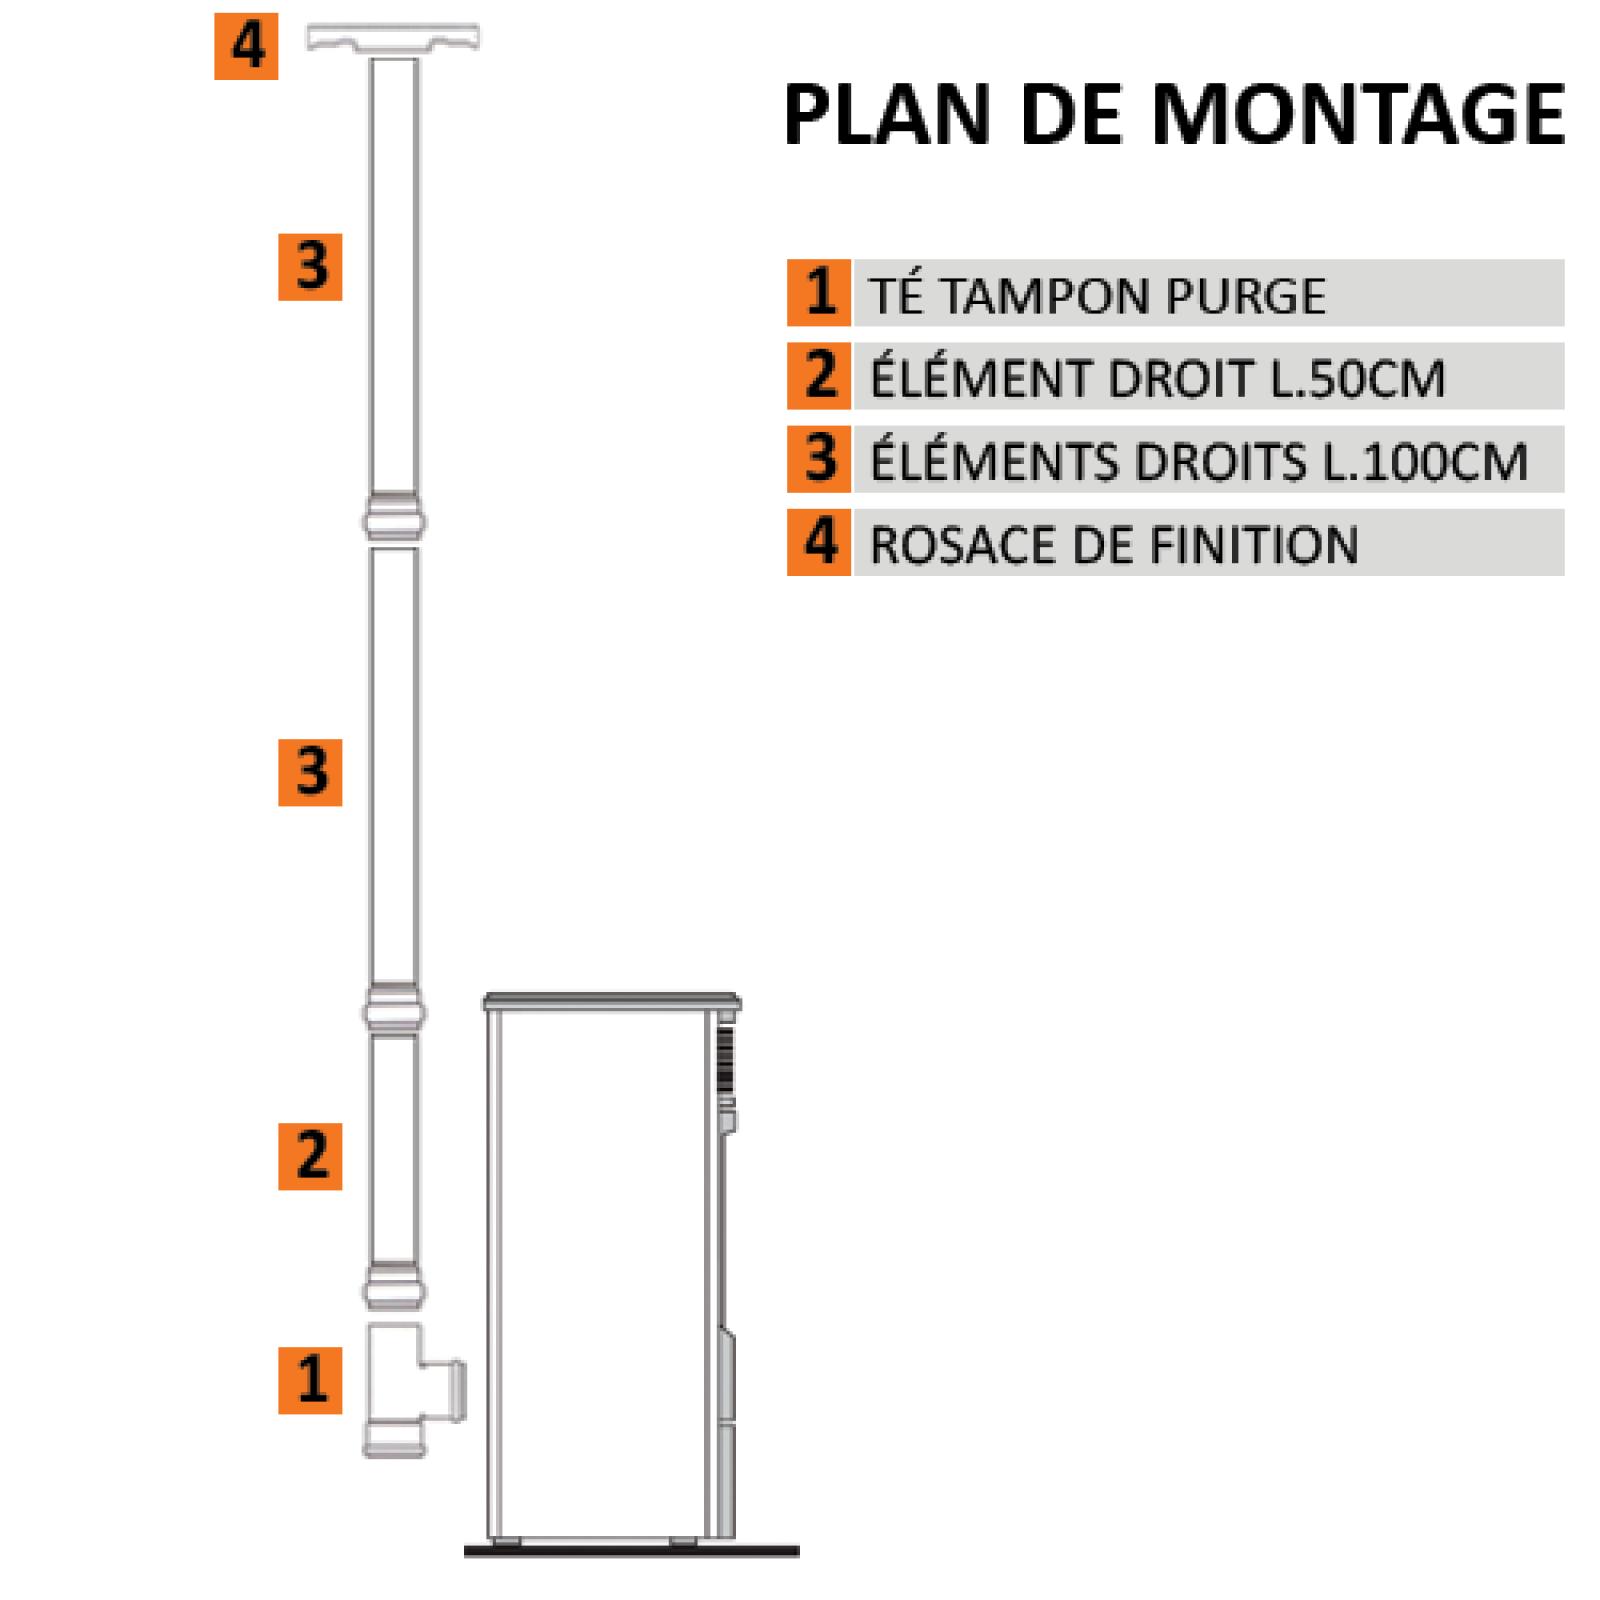 Kit Poujoulat Tuyaux Evacuation Poele Granule